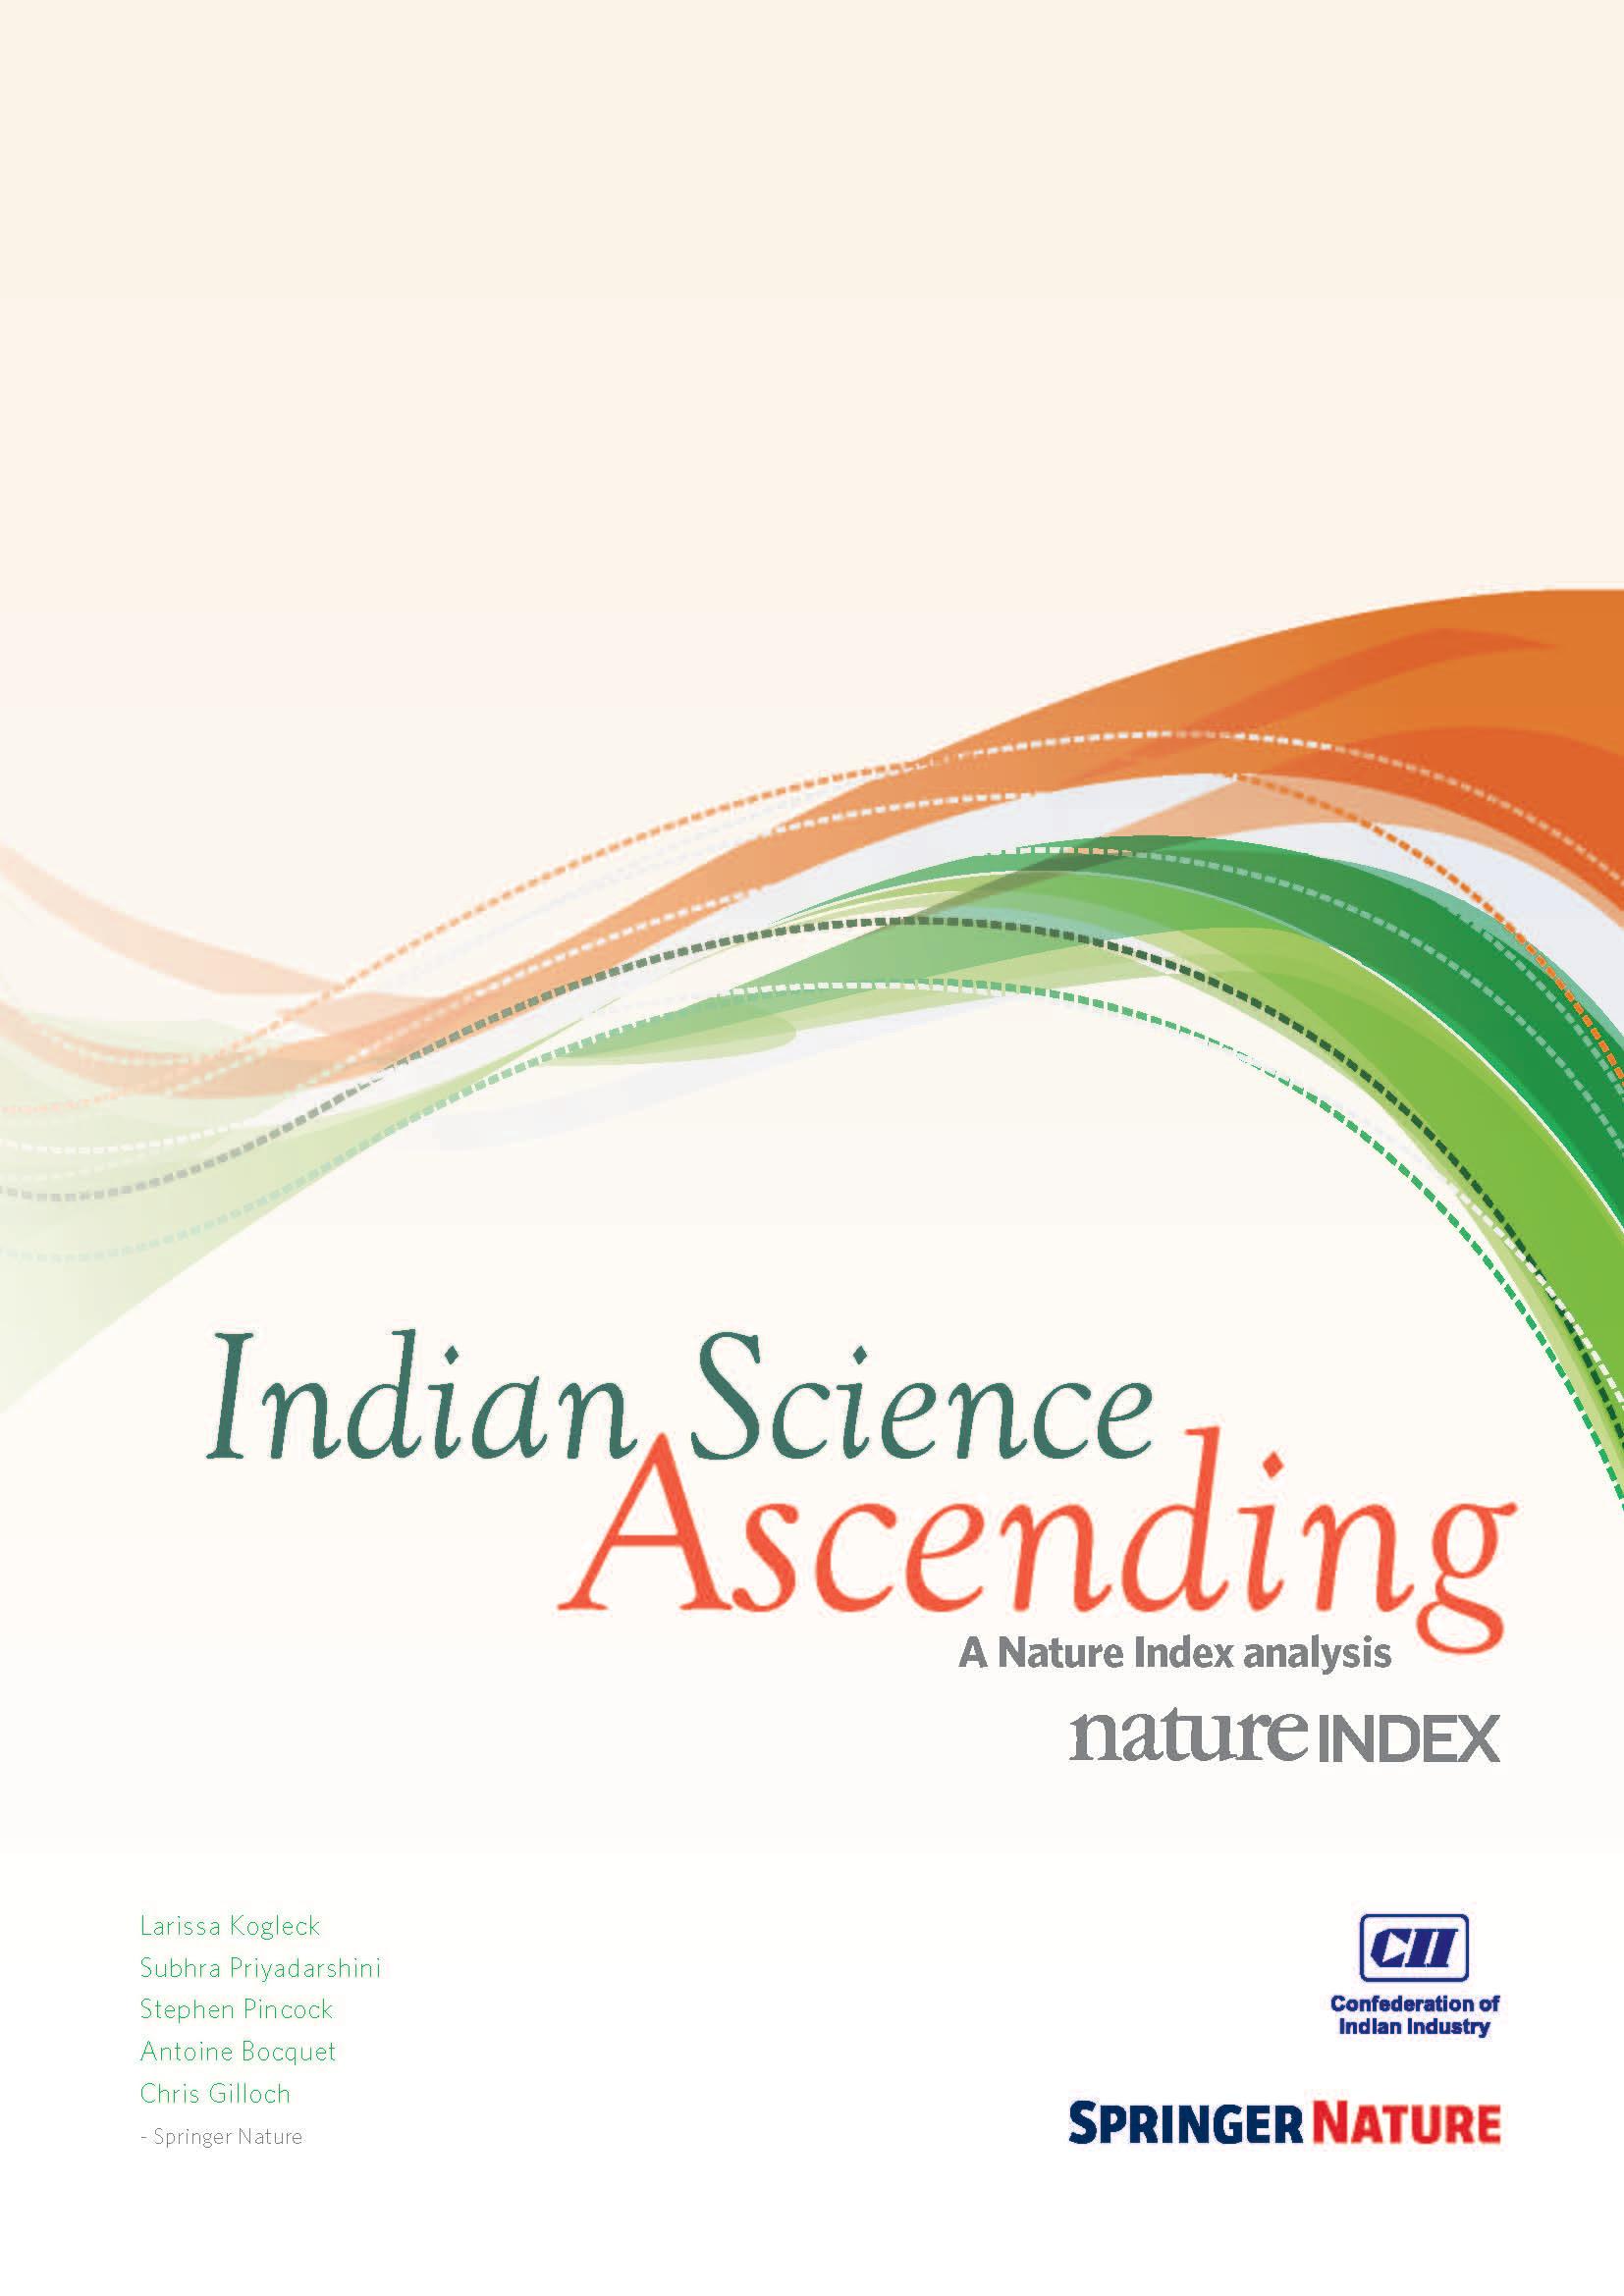 Indias University Chemistry Facilities In Need Of Overhaul News